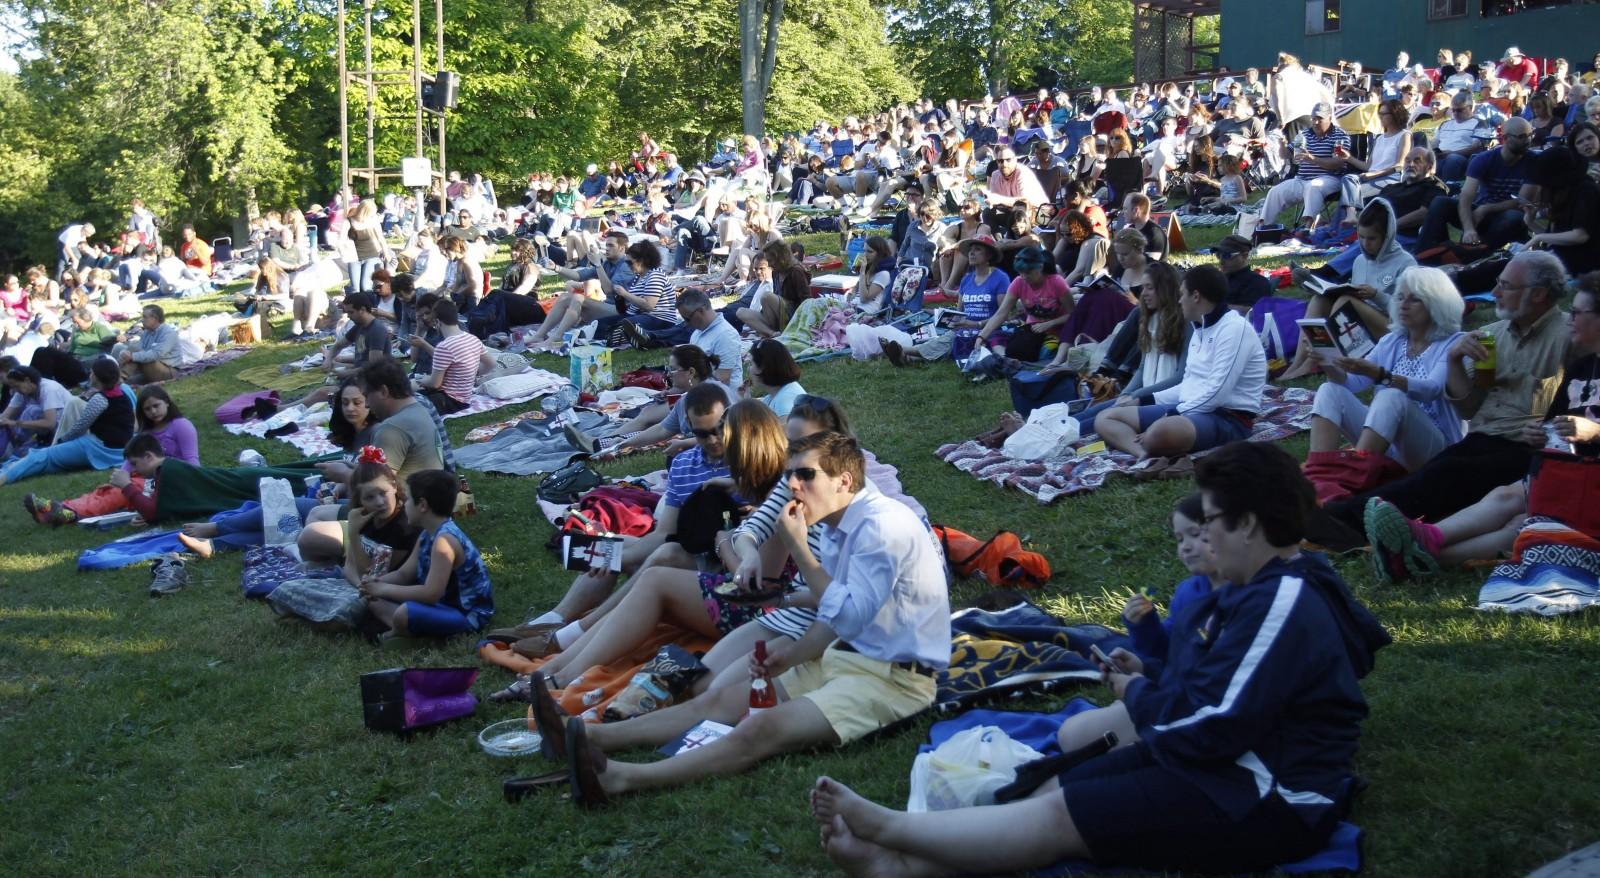 The 40th season of Shakespeare in the Park begins June 18. (Sharon Cantillon/Buffalo News file photo)